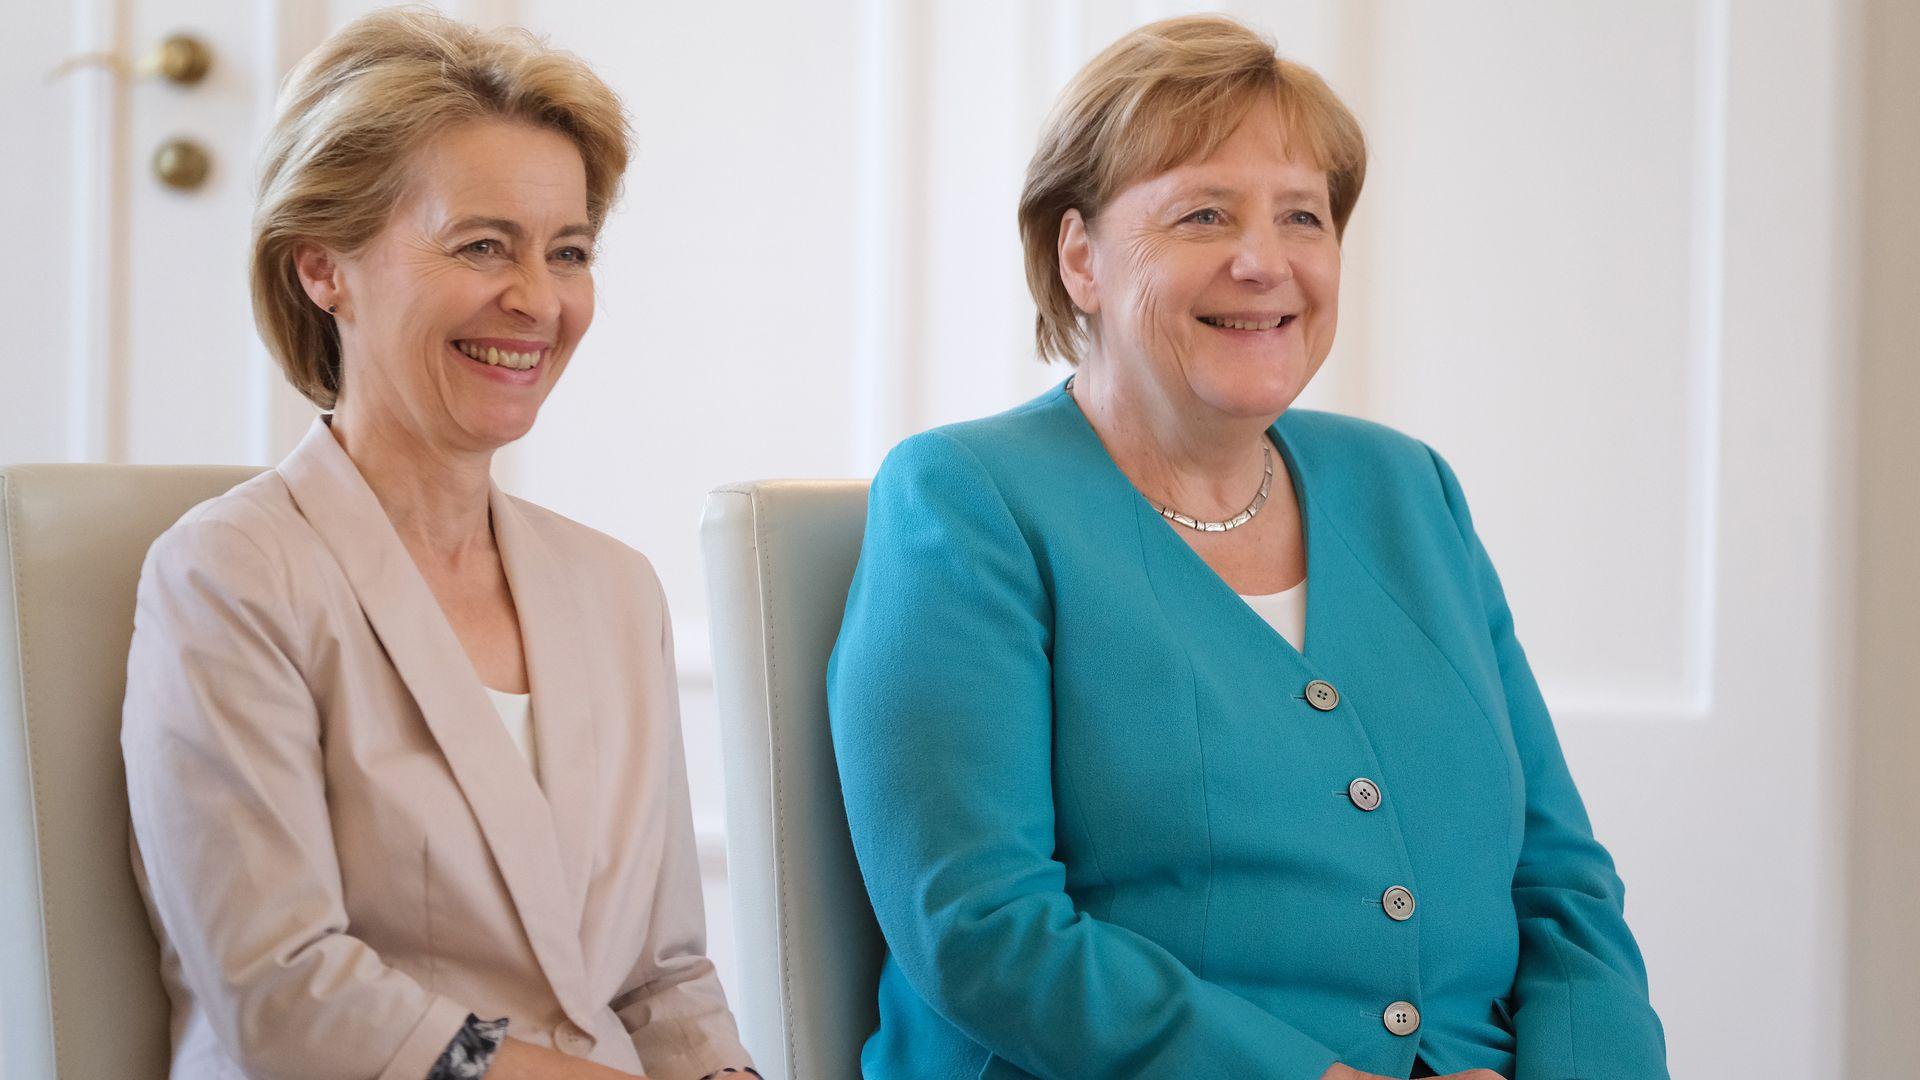 Ursula von der Leyen to take helm of a divided EU - Axios